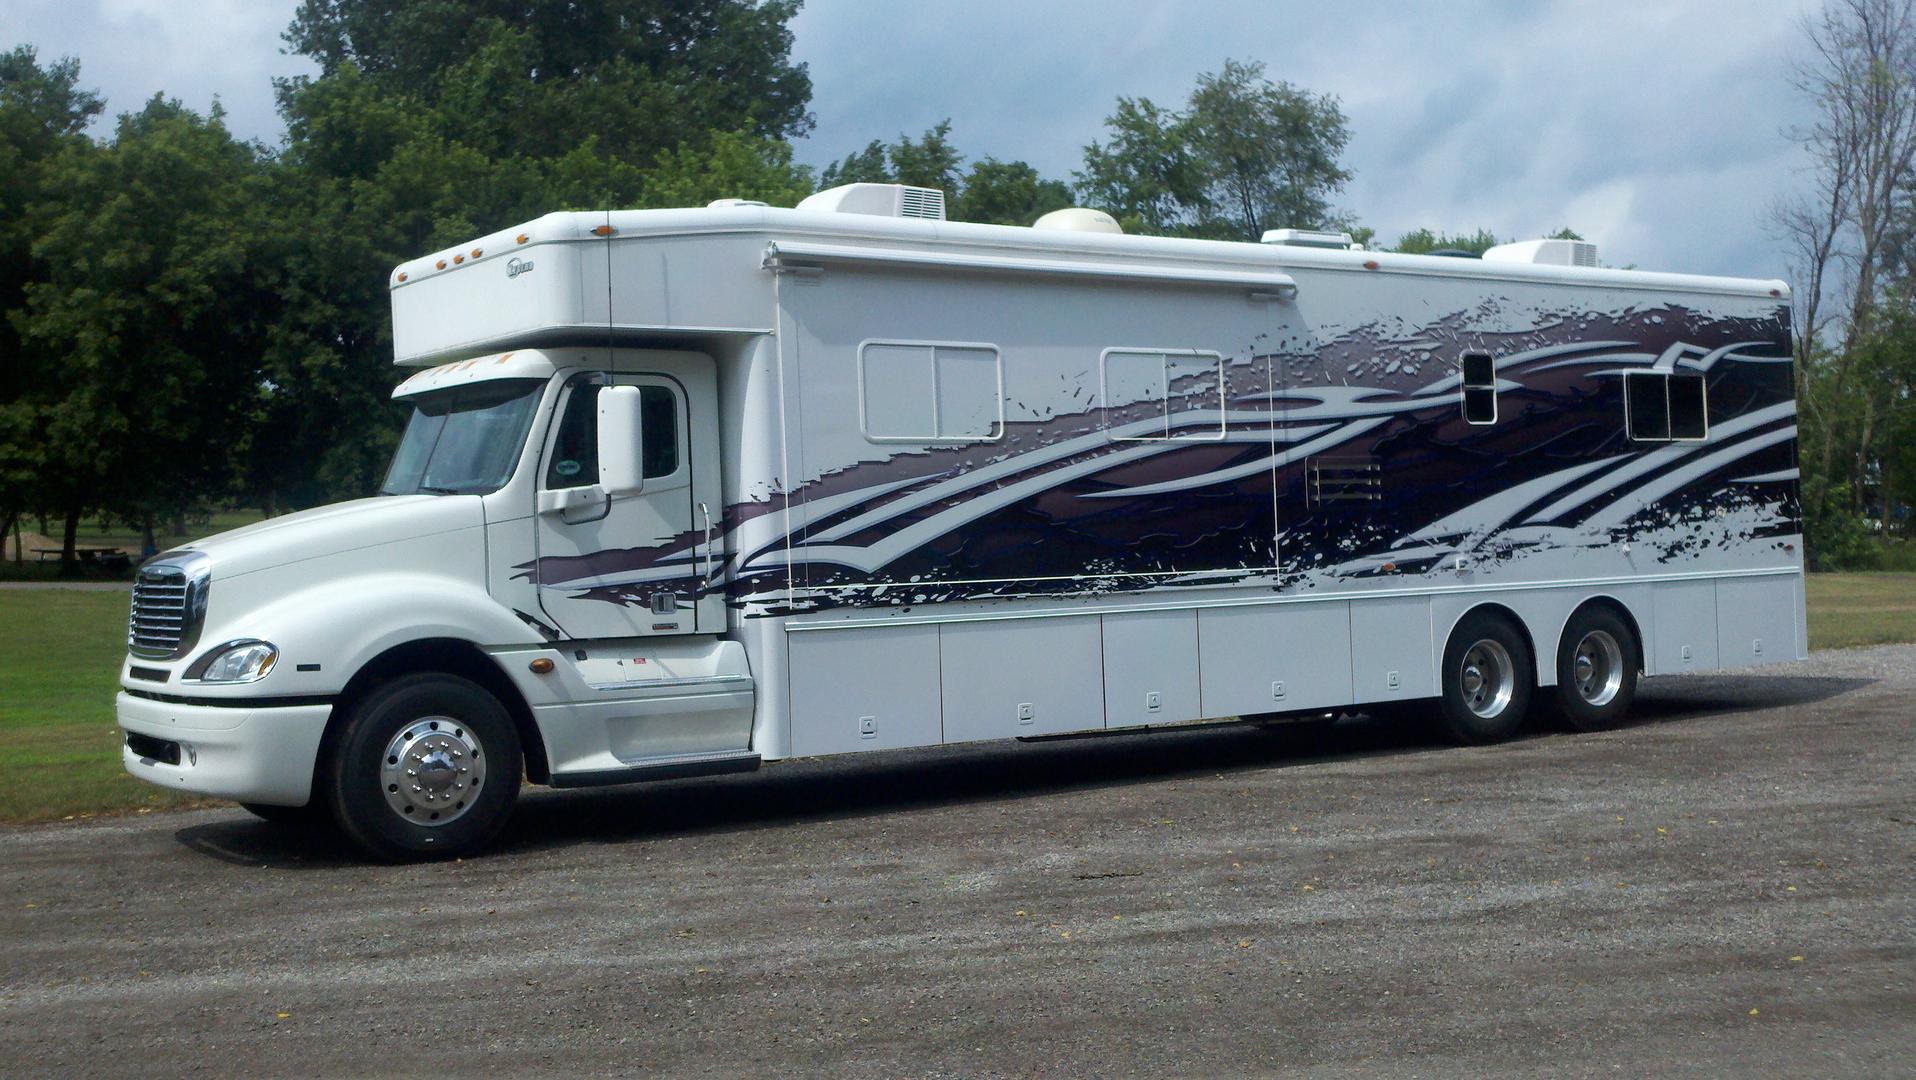 Semi, Bus, Trailer and RV Wraps